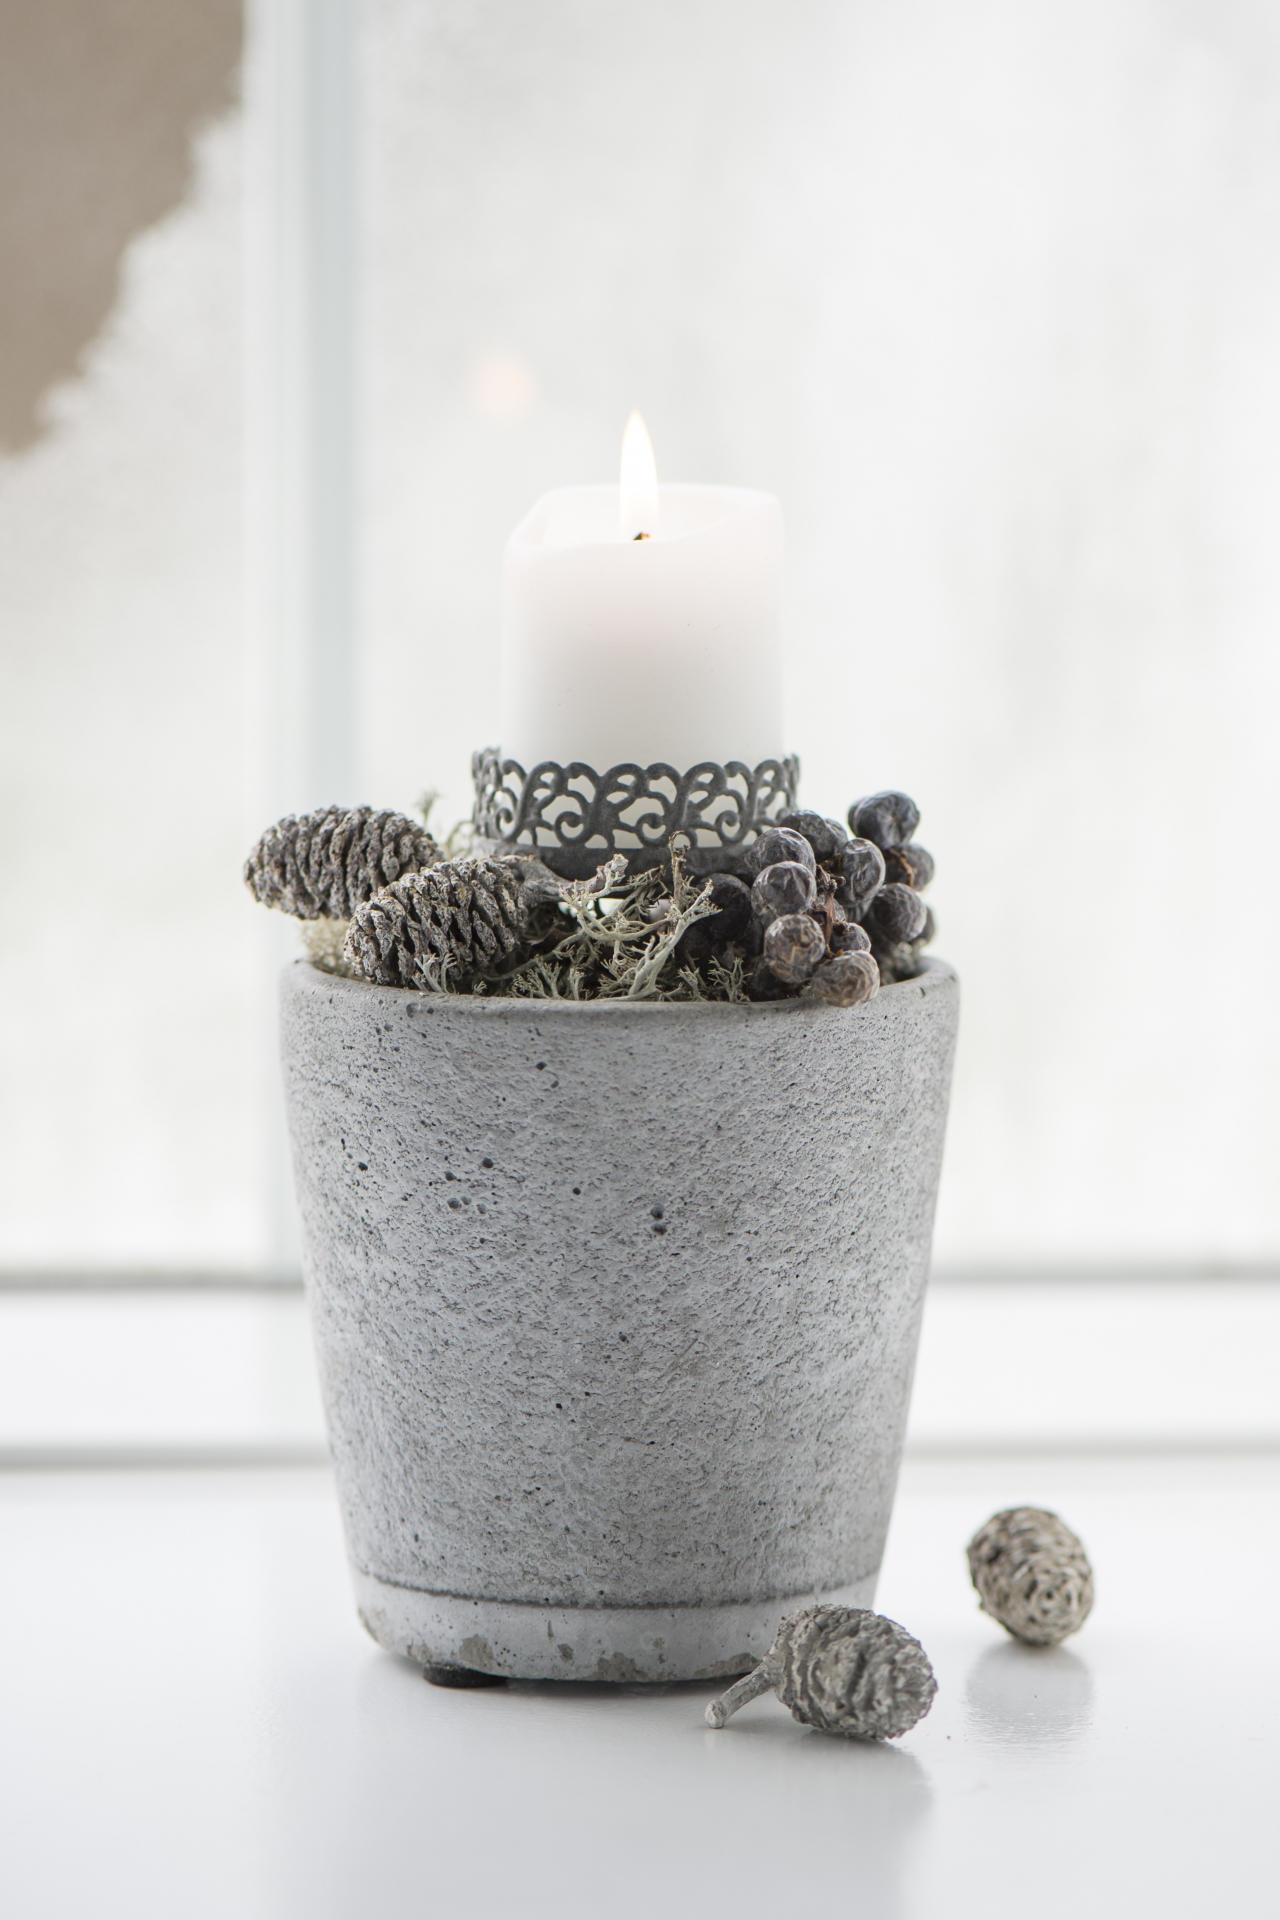 IB LAURSEN Betonový květník Concrete S, šedá barva, beton